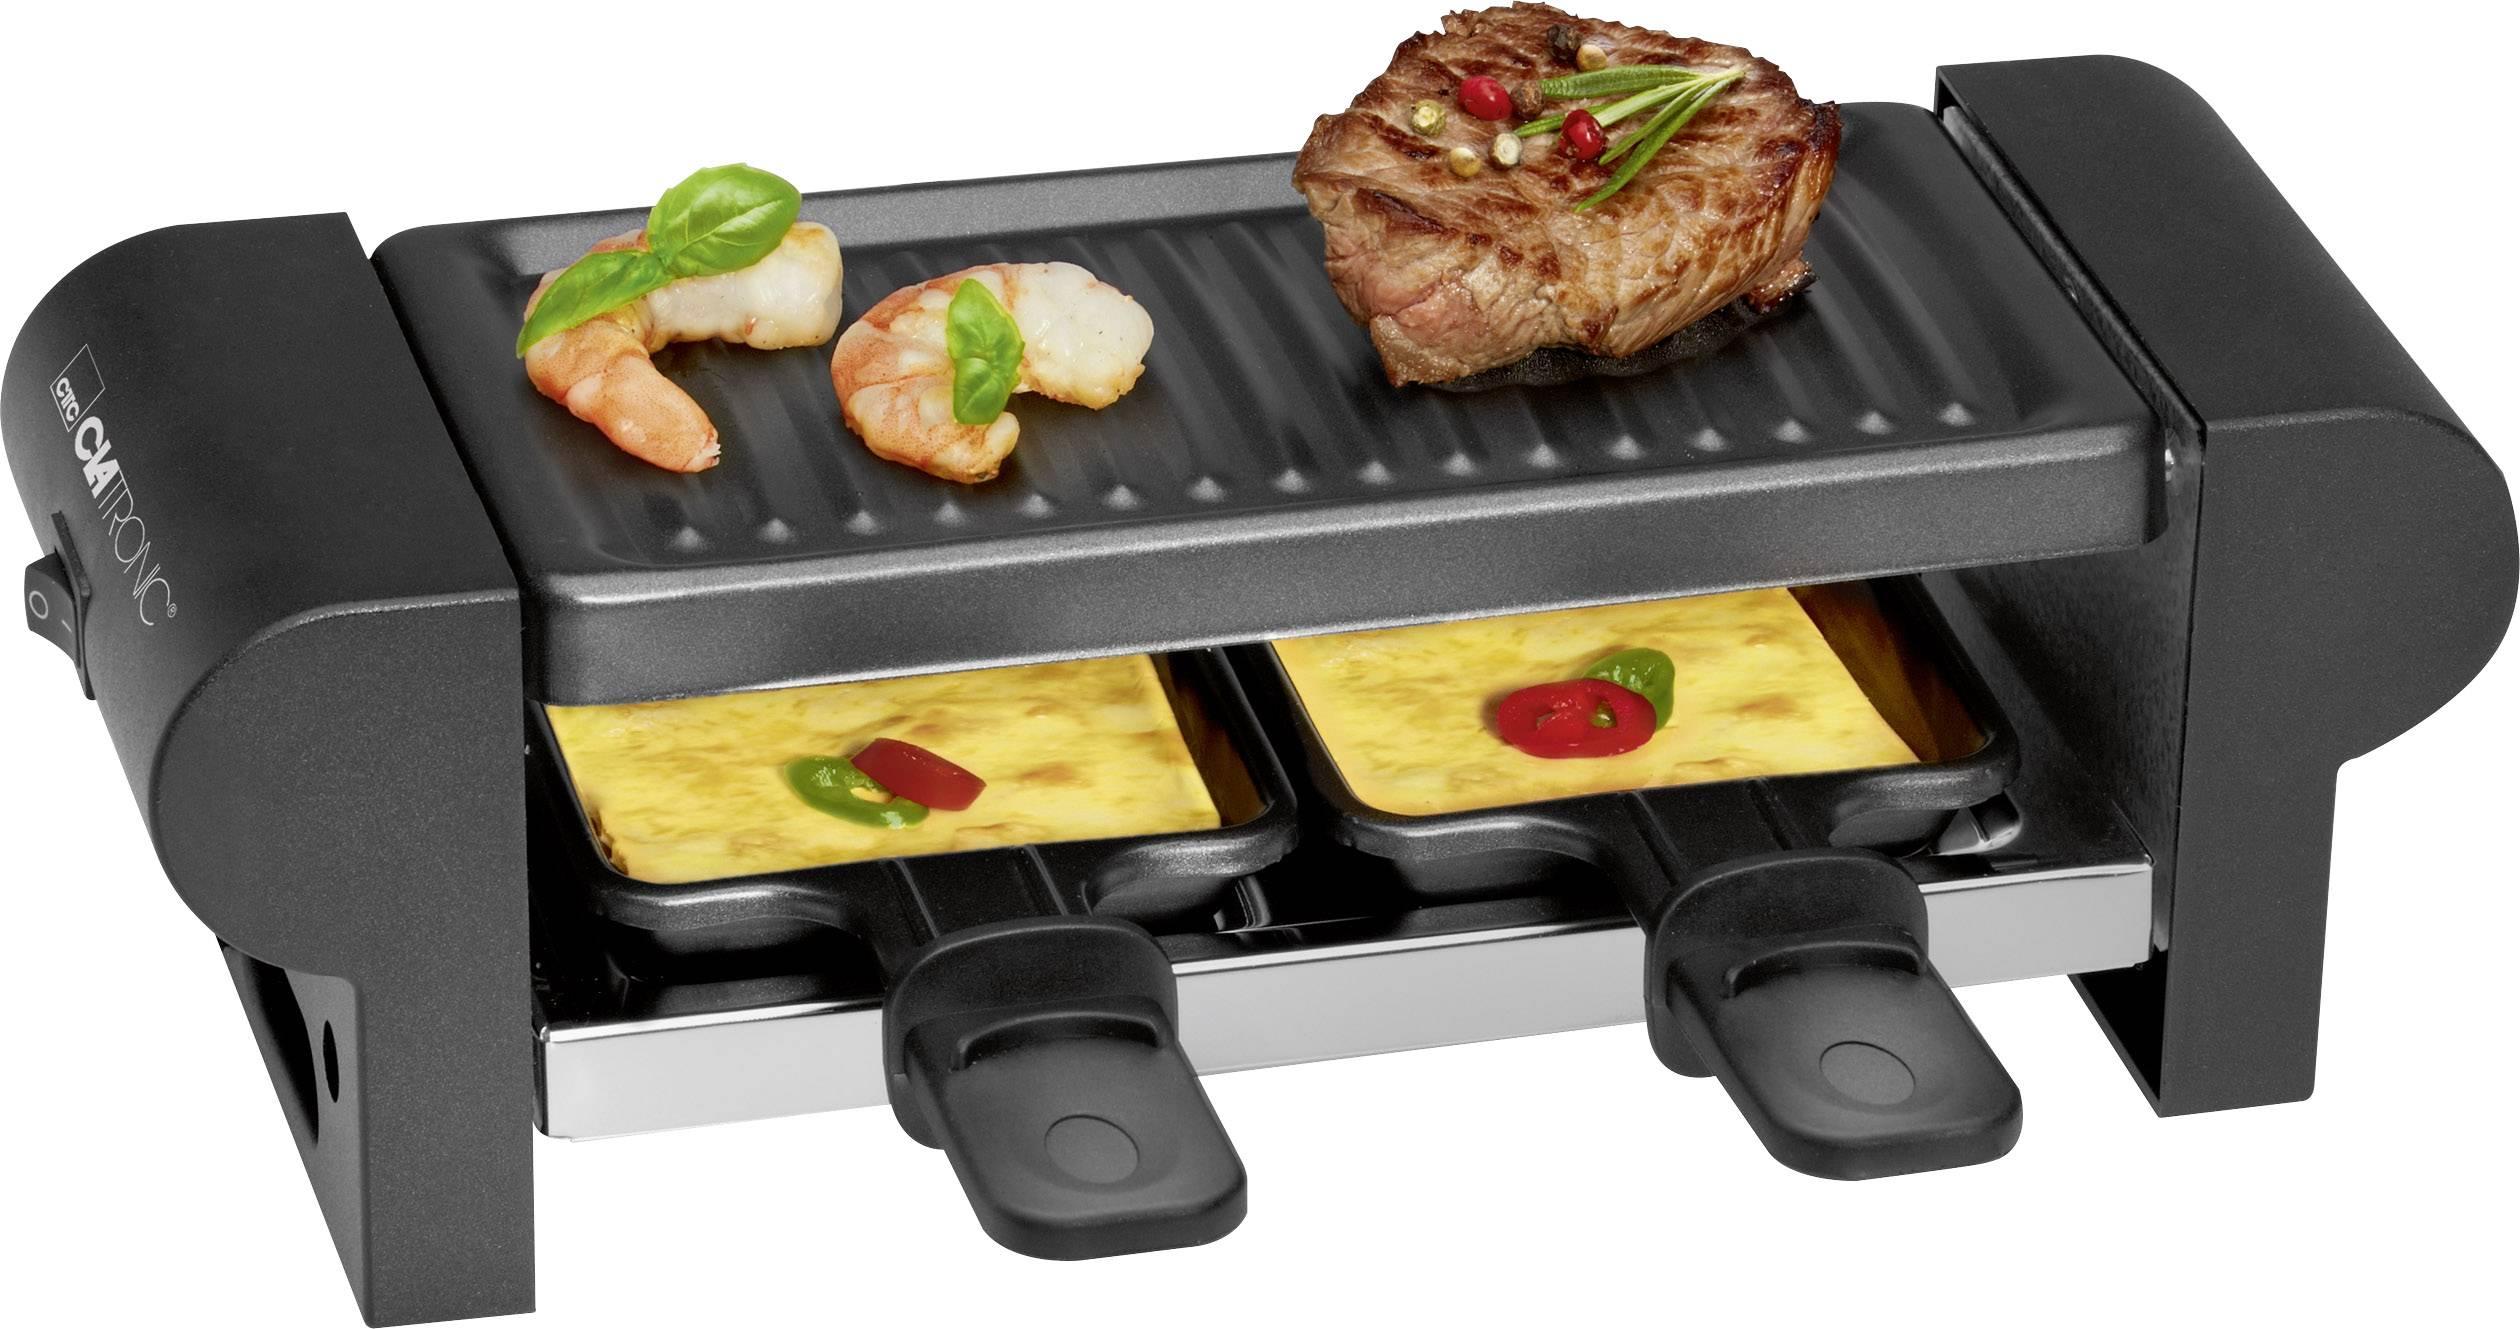 Severin Elektrogrill Kurzschluss : Raclette günstig online kaufen bei conrad